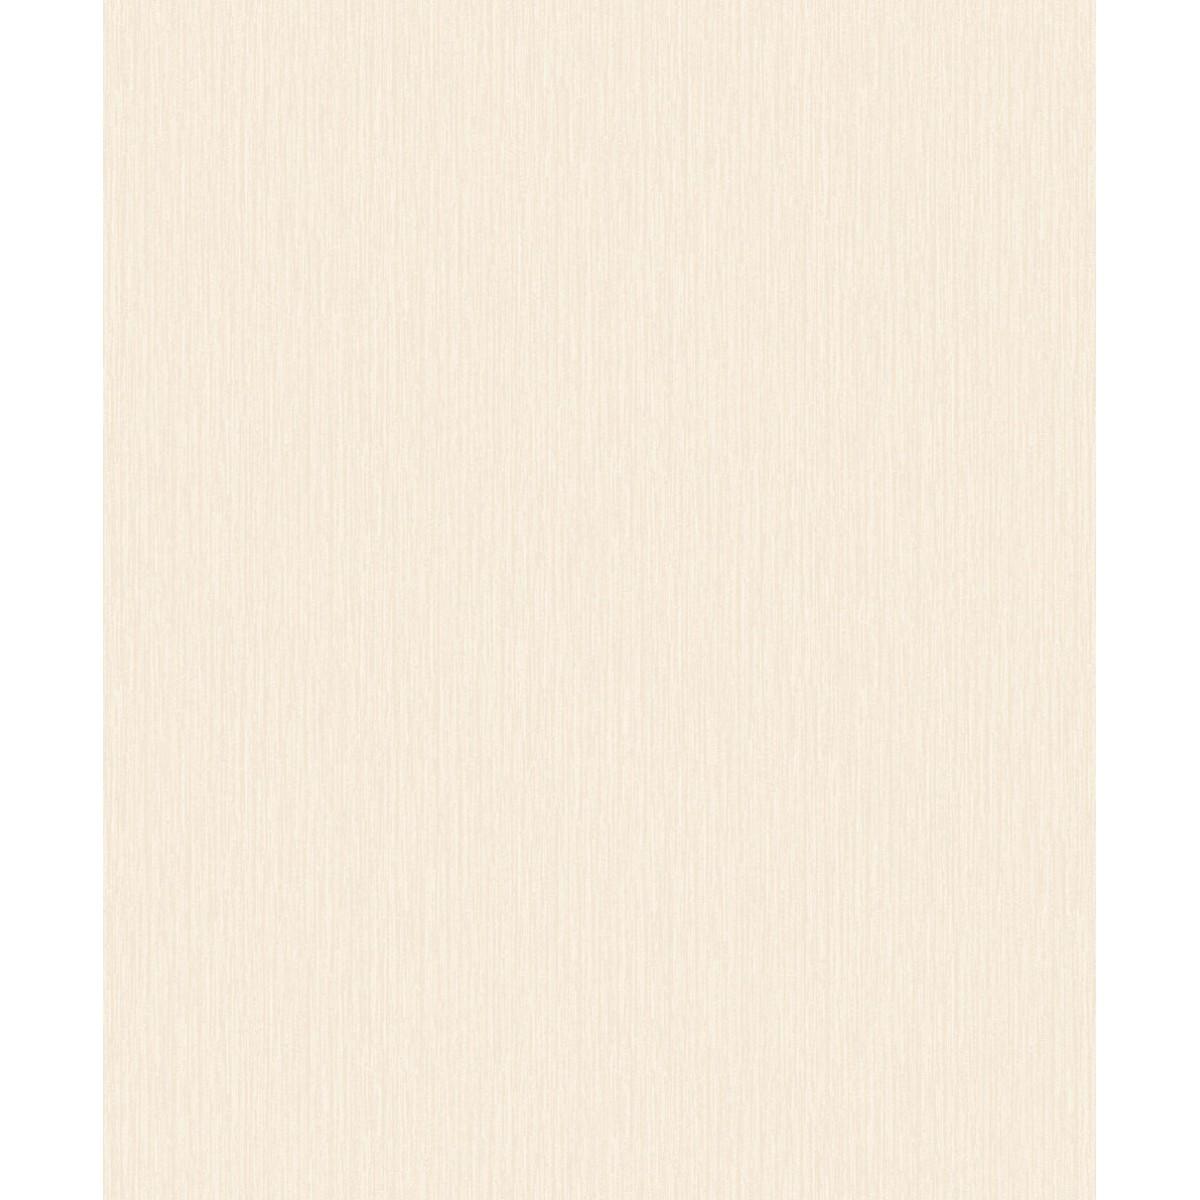 Glitter Wall Sticker Plain Beige Wallpaper Wallpapersafari